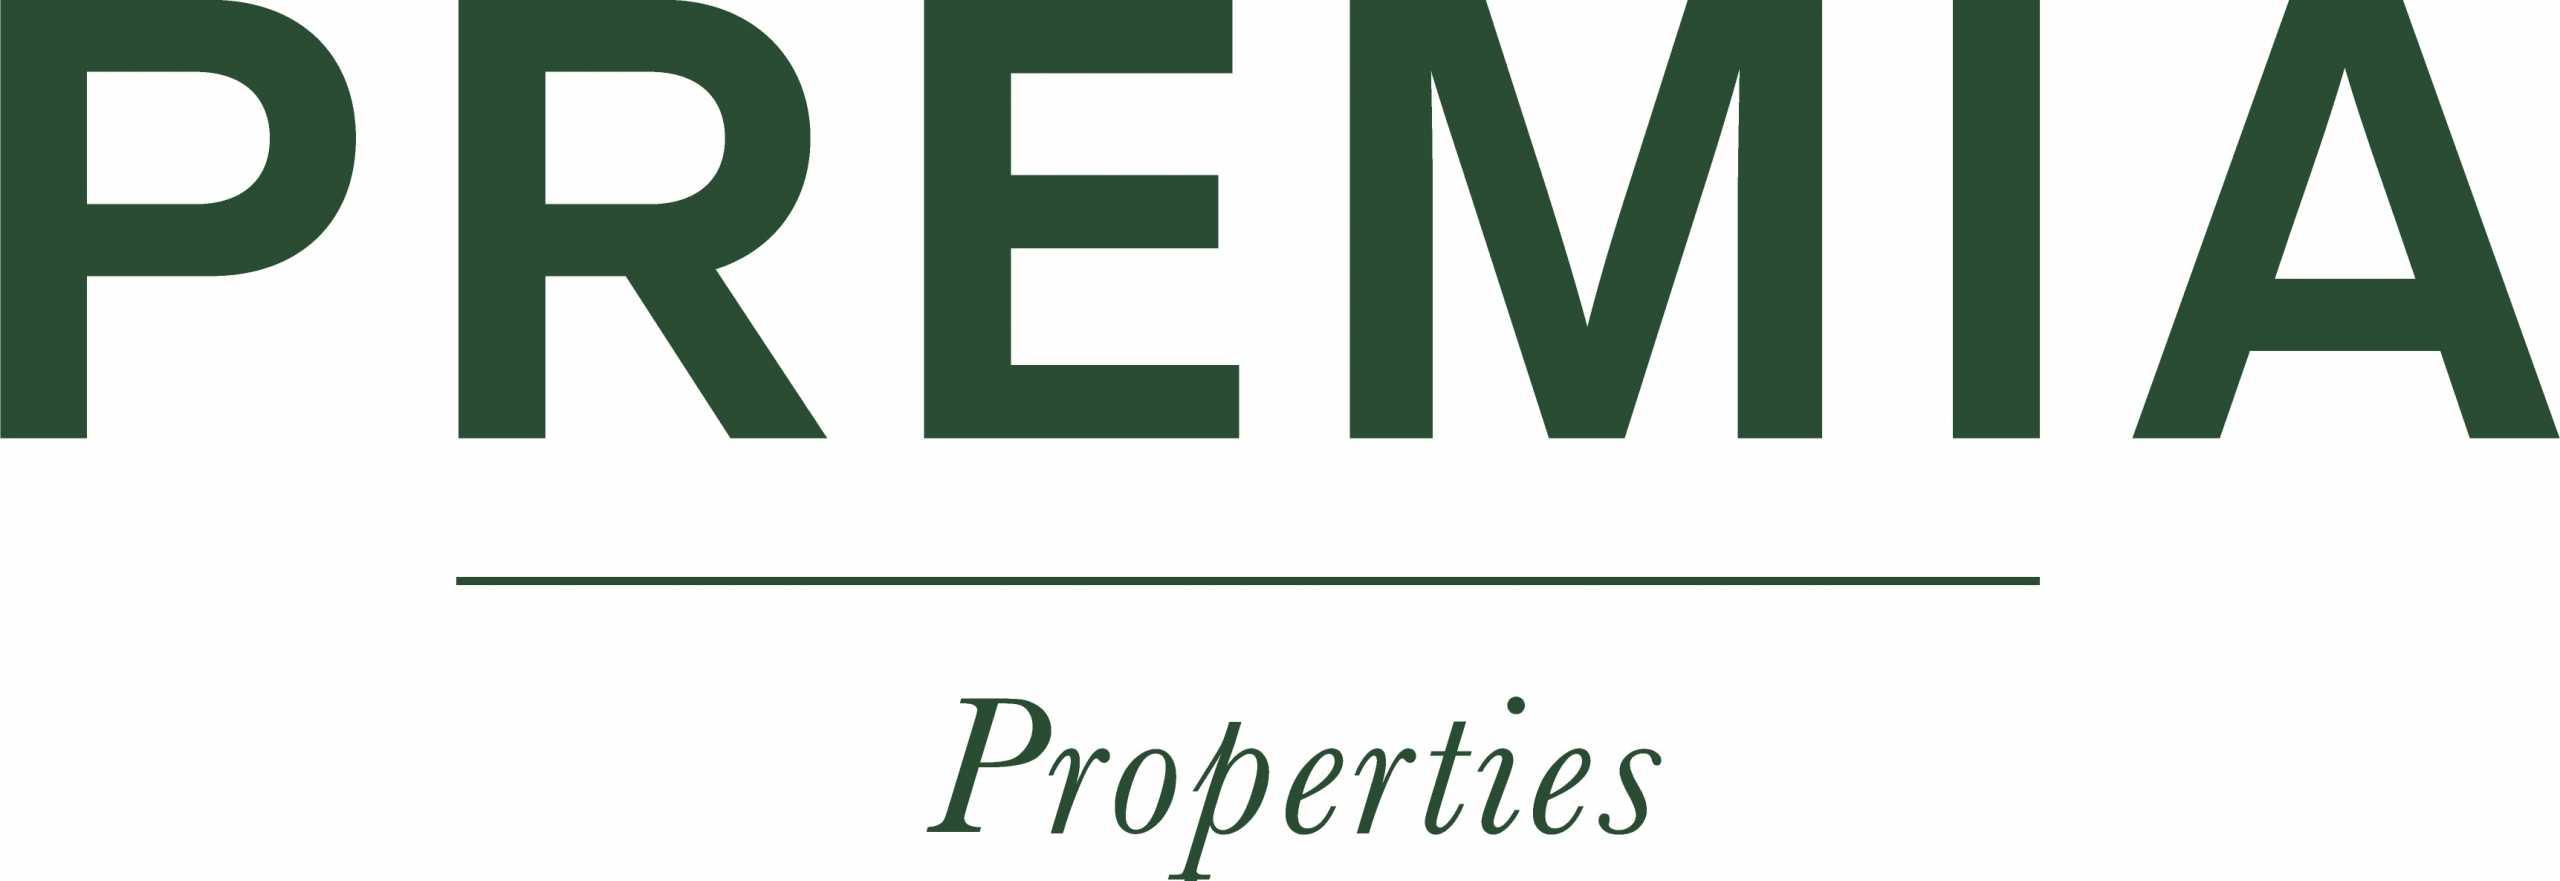 Premia Properties: Νέες επενδύσεις στα ακίνητα μετά την υπερκάλυψη της αύξησης μετοχικού κεφαλαίου